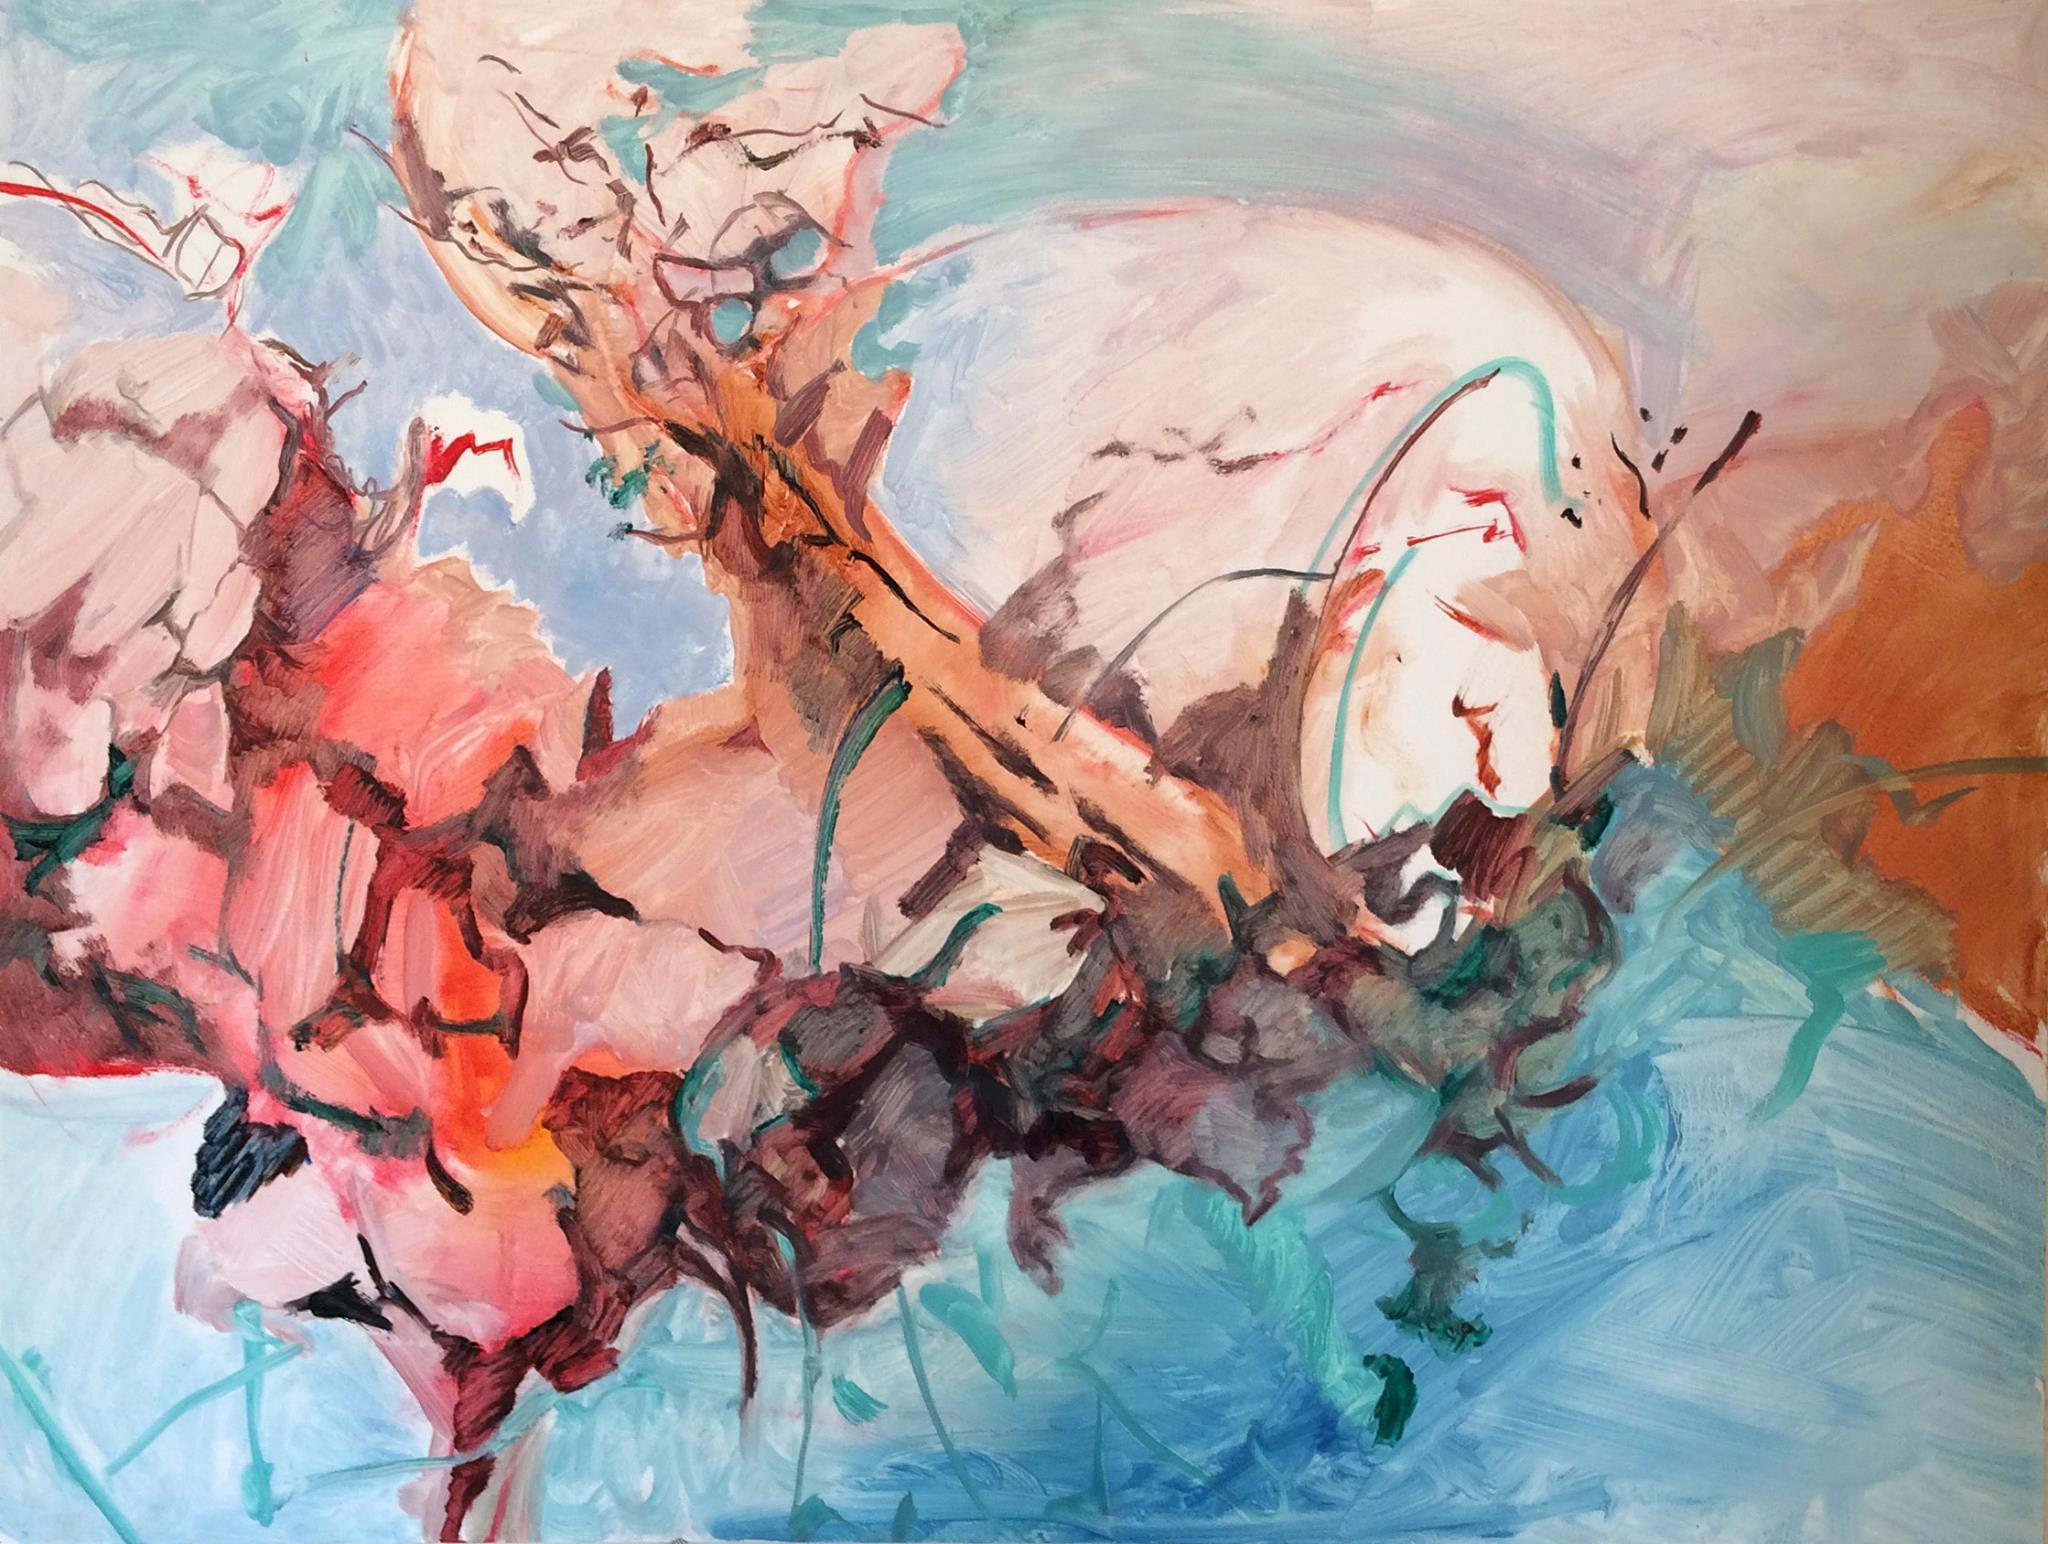 Life-world-outer-layer-original-harry-zed-hughes-artwork-fantasy-world-paint-melbourne-form-energy-painting-good-best-melbourne-scifi-surreal-artist-studio-imagination.jpg